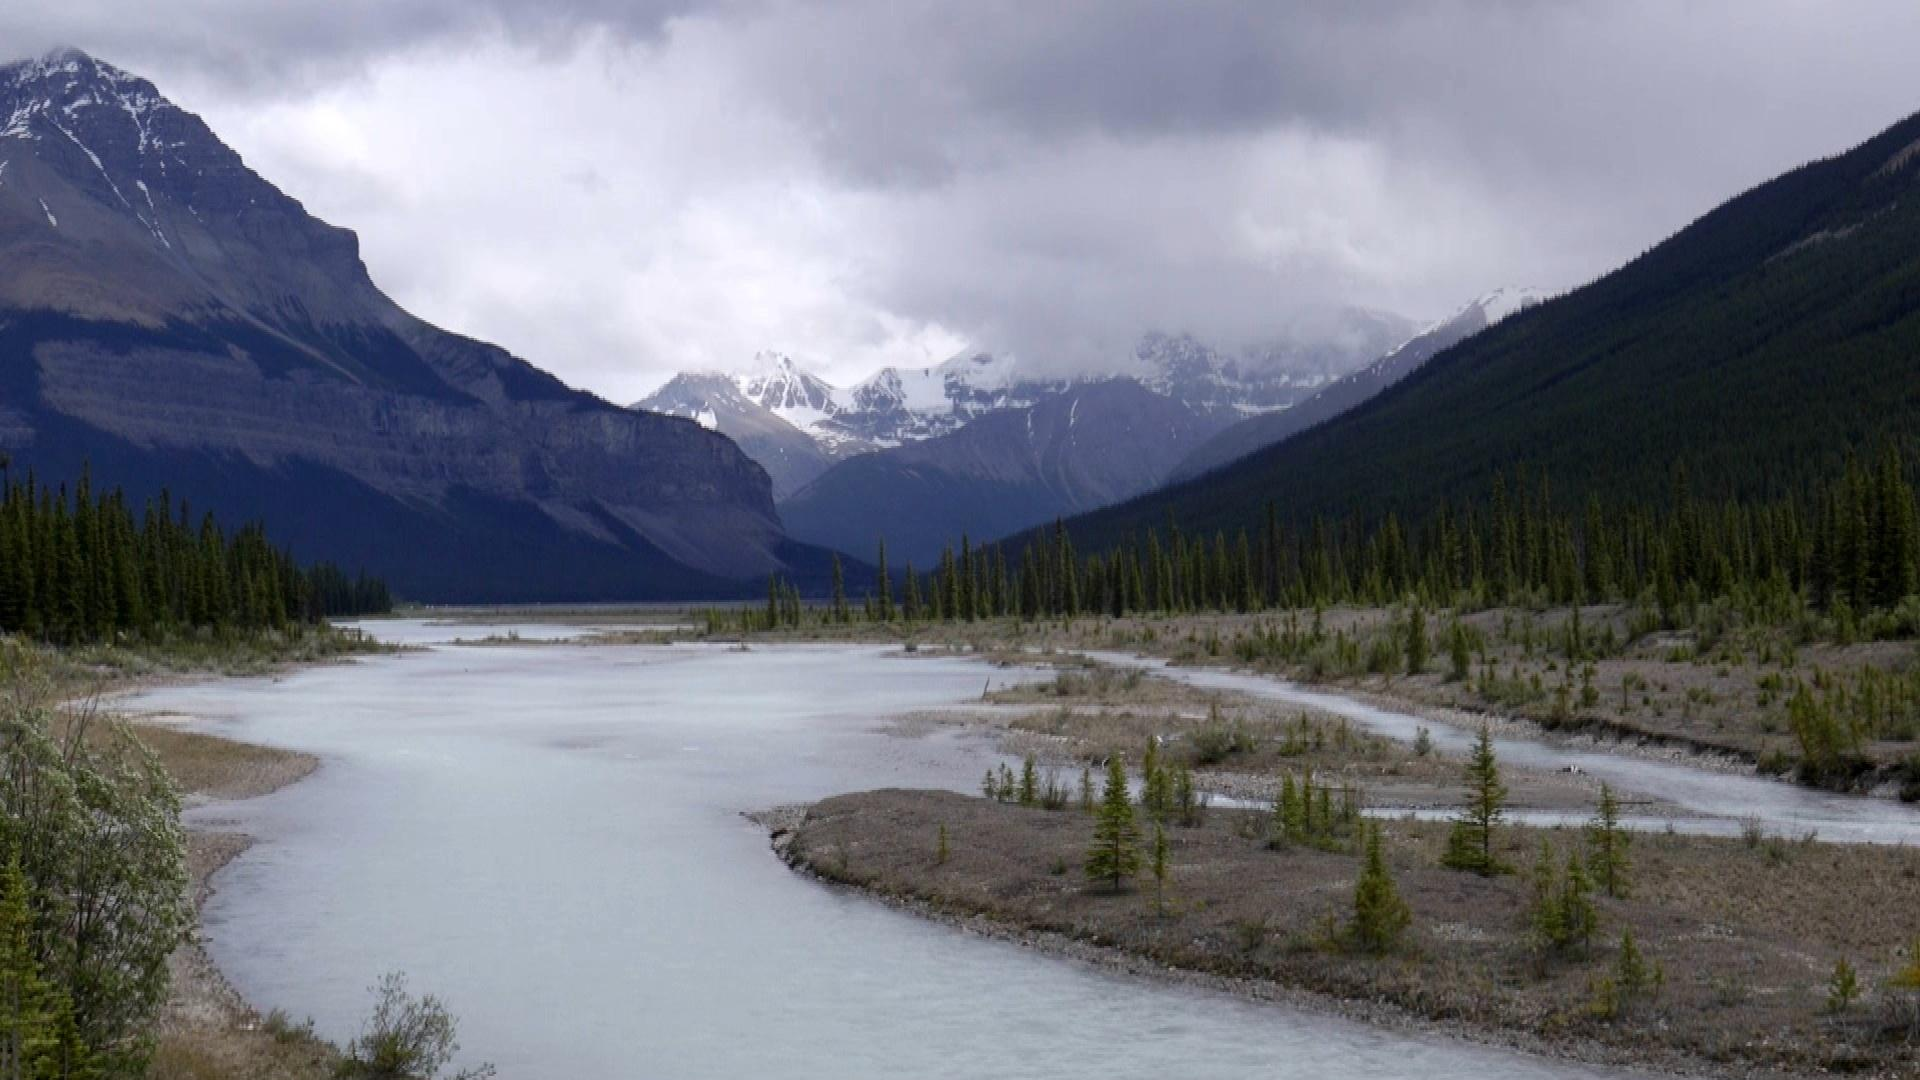 Jasper wilderness, lake and mountain